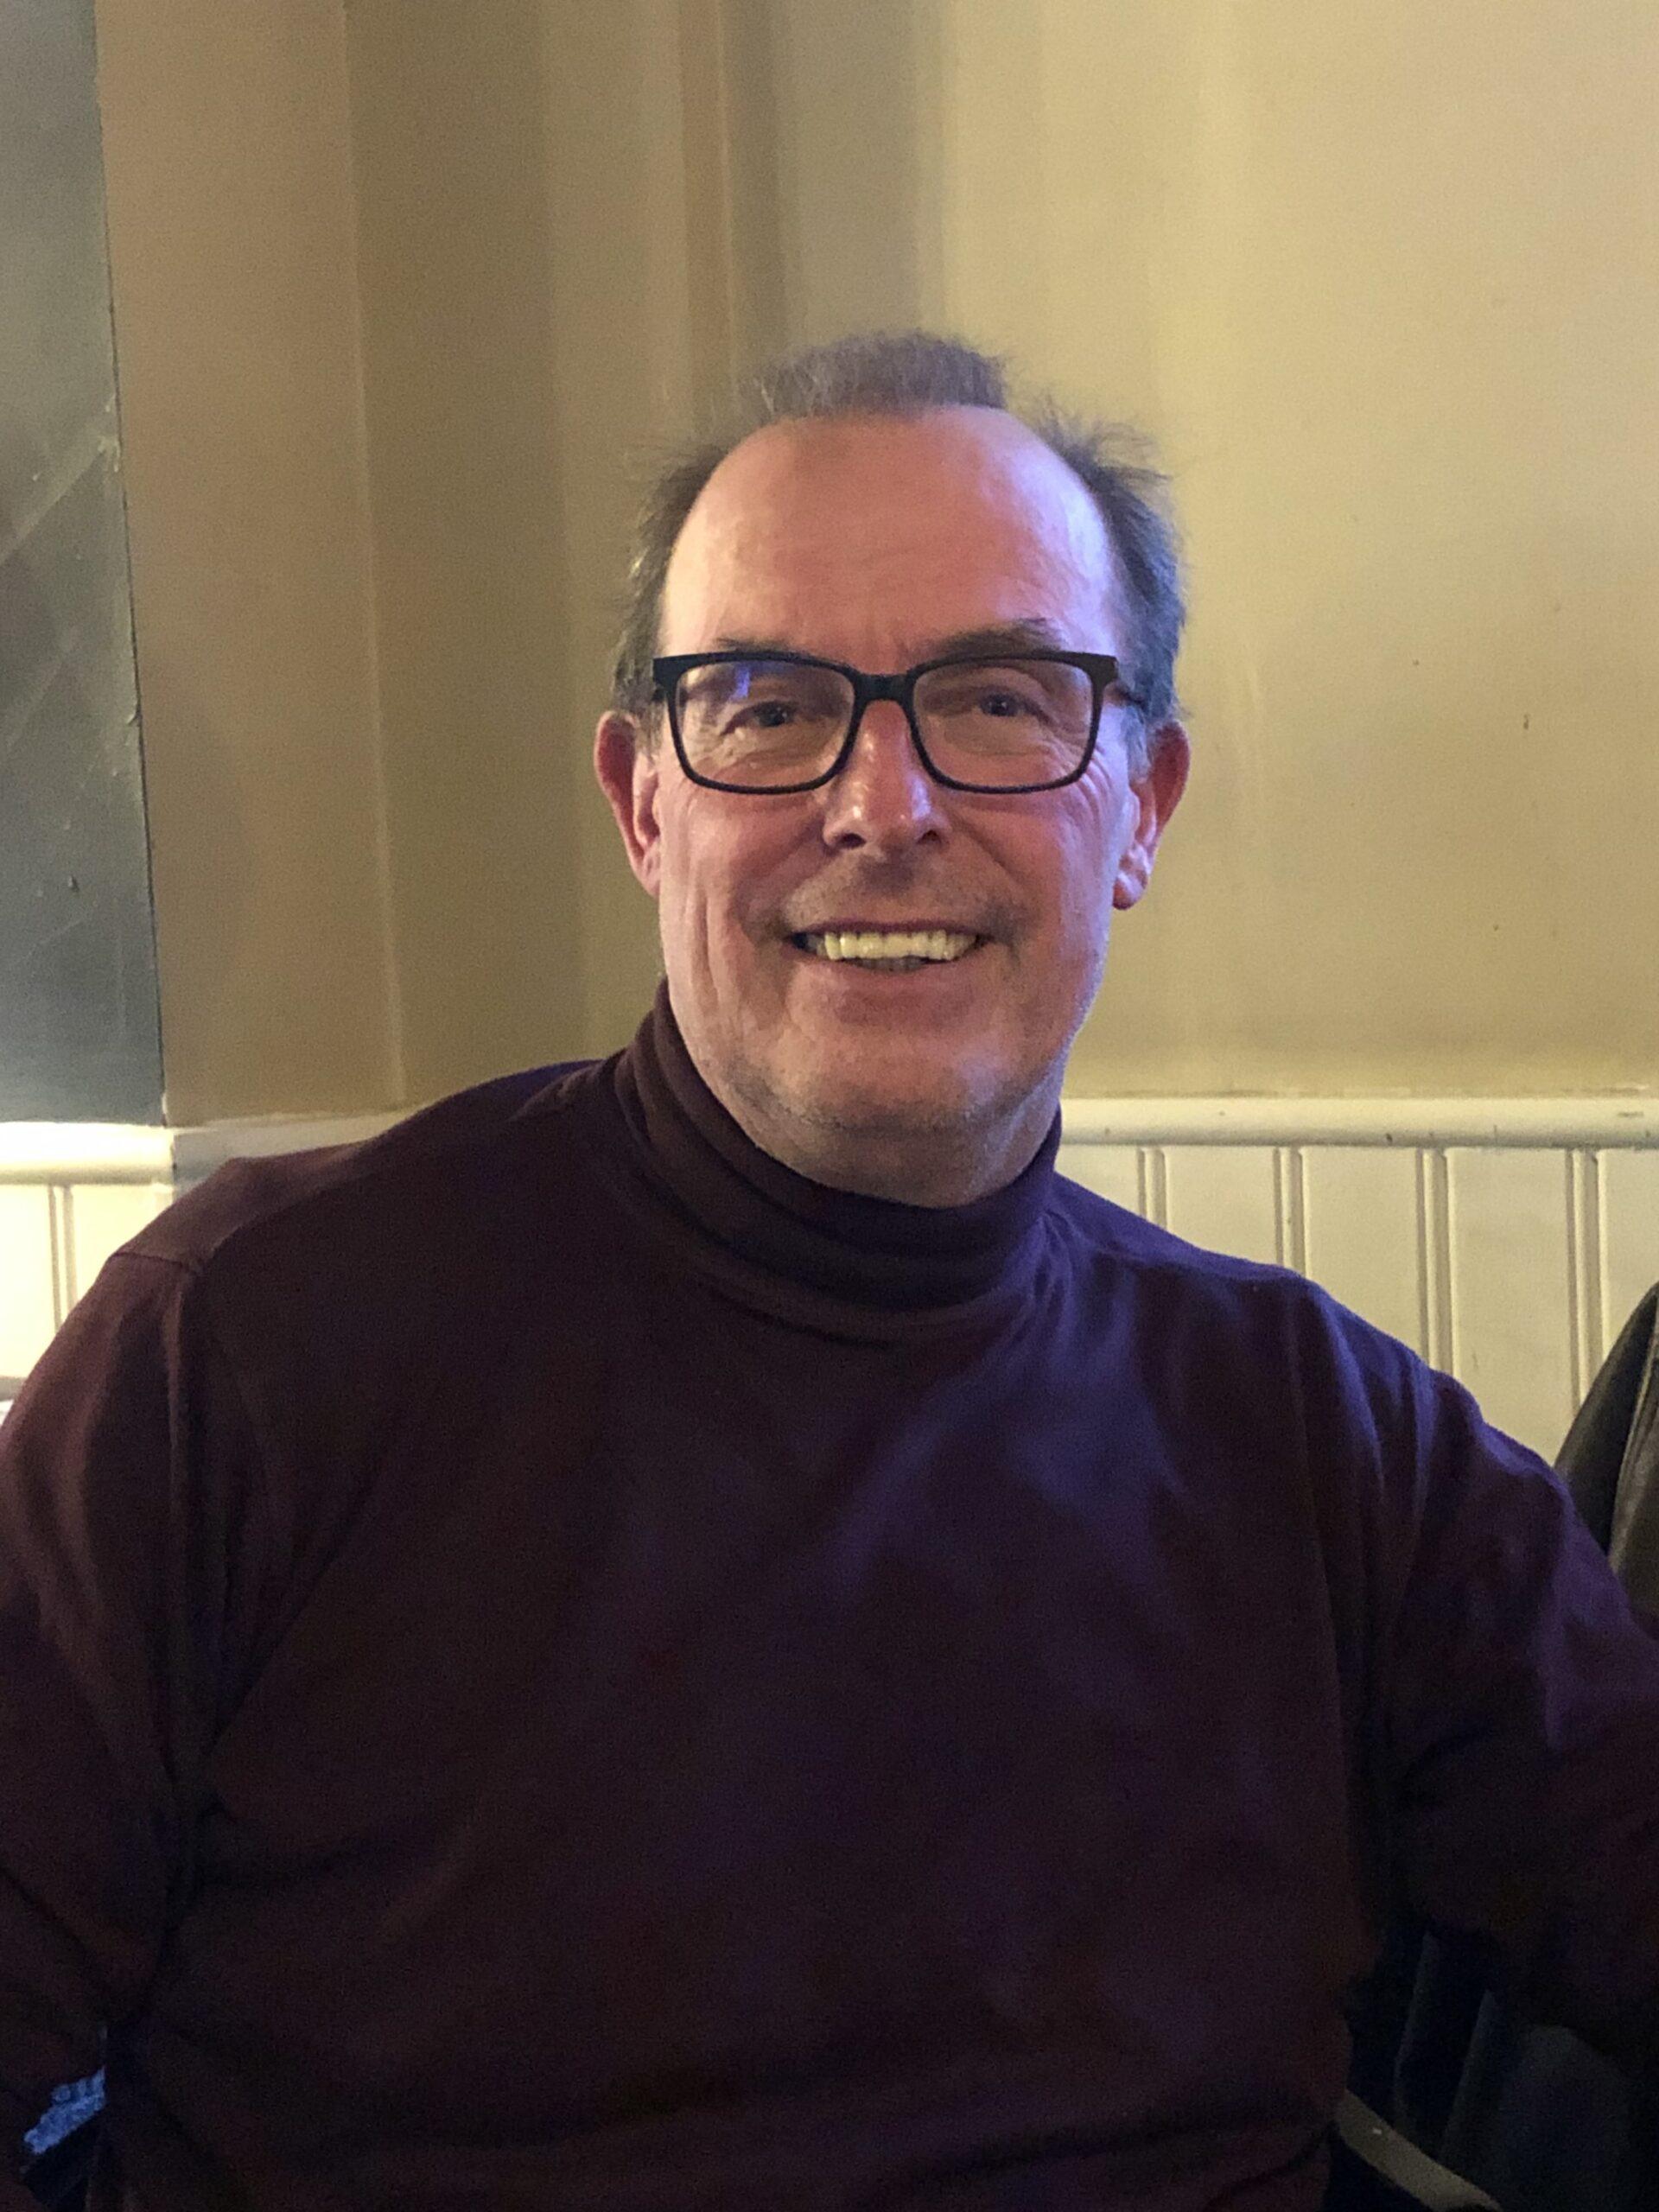 Mark Rapley